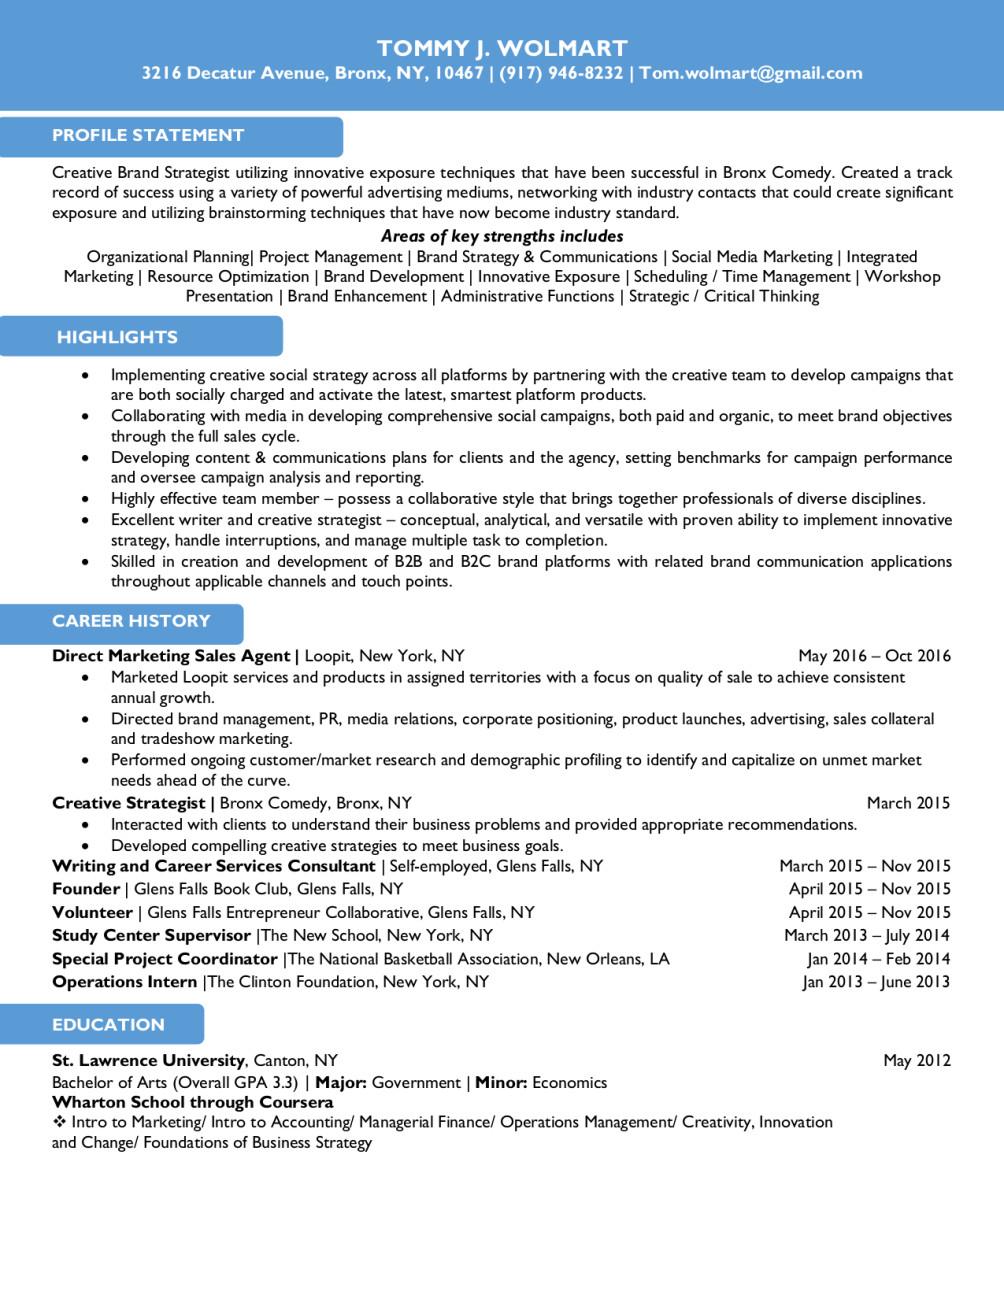 Be Your Resume Writer For Ats Resume Resume Rewrite Resume Writing